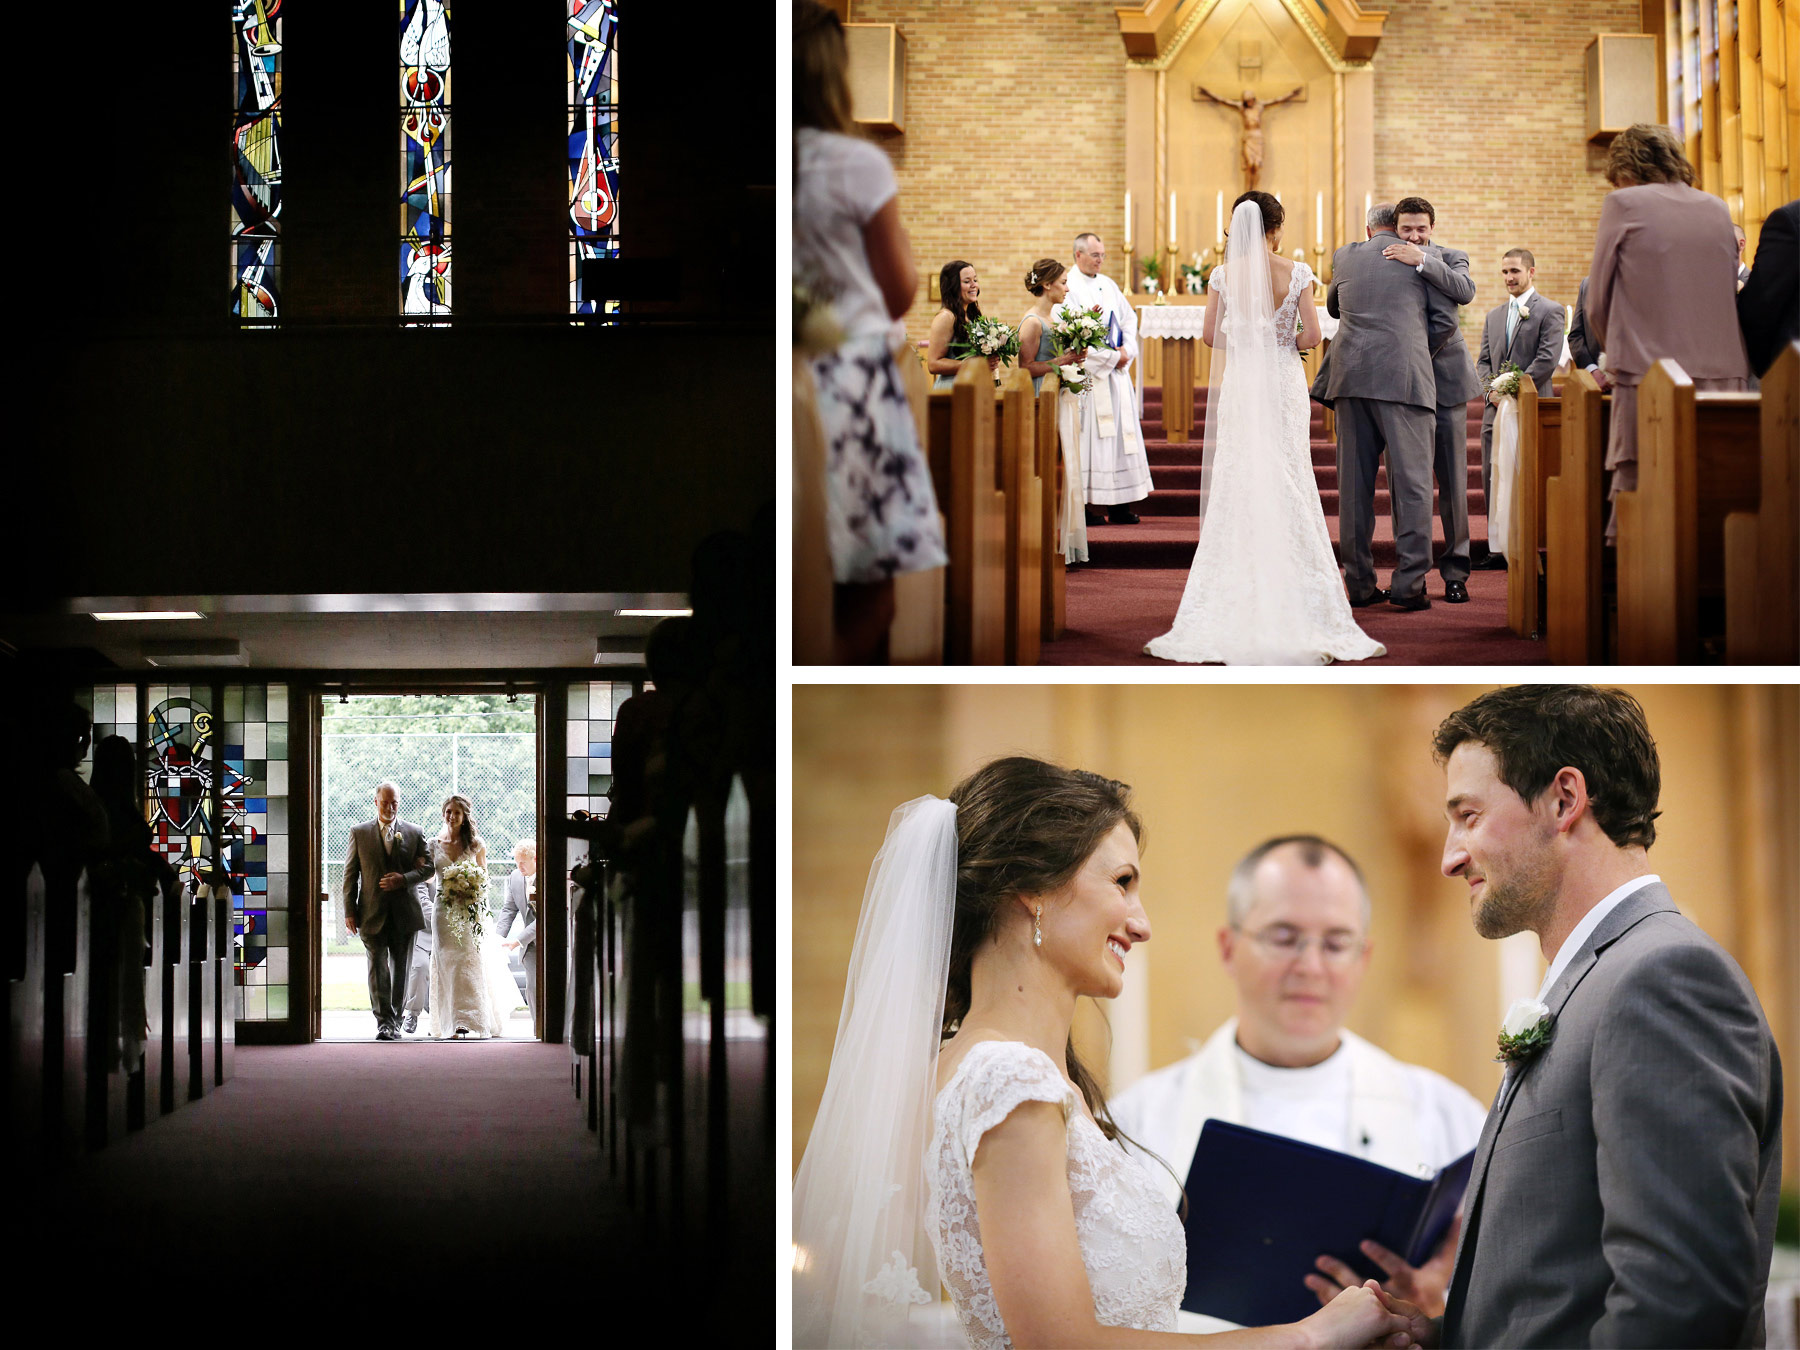 05-Stillwater-Minnesota-Wedding-Photography-by-Vick-Photography--St-Patricks-Church-Ceremony-Alicia-&-Cole.jpg